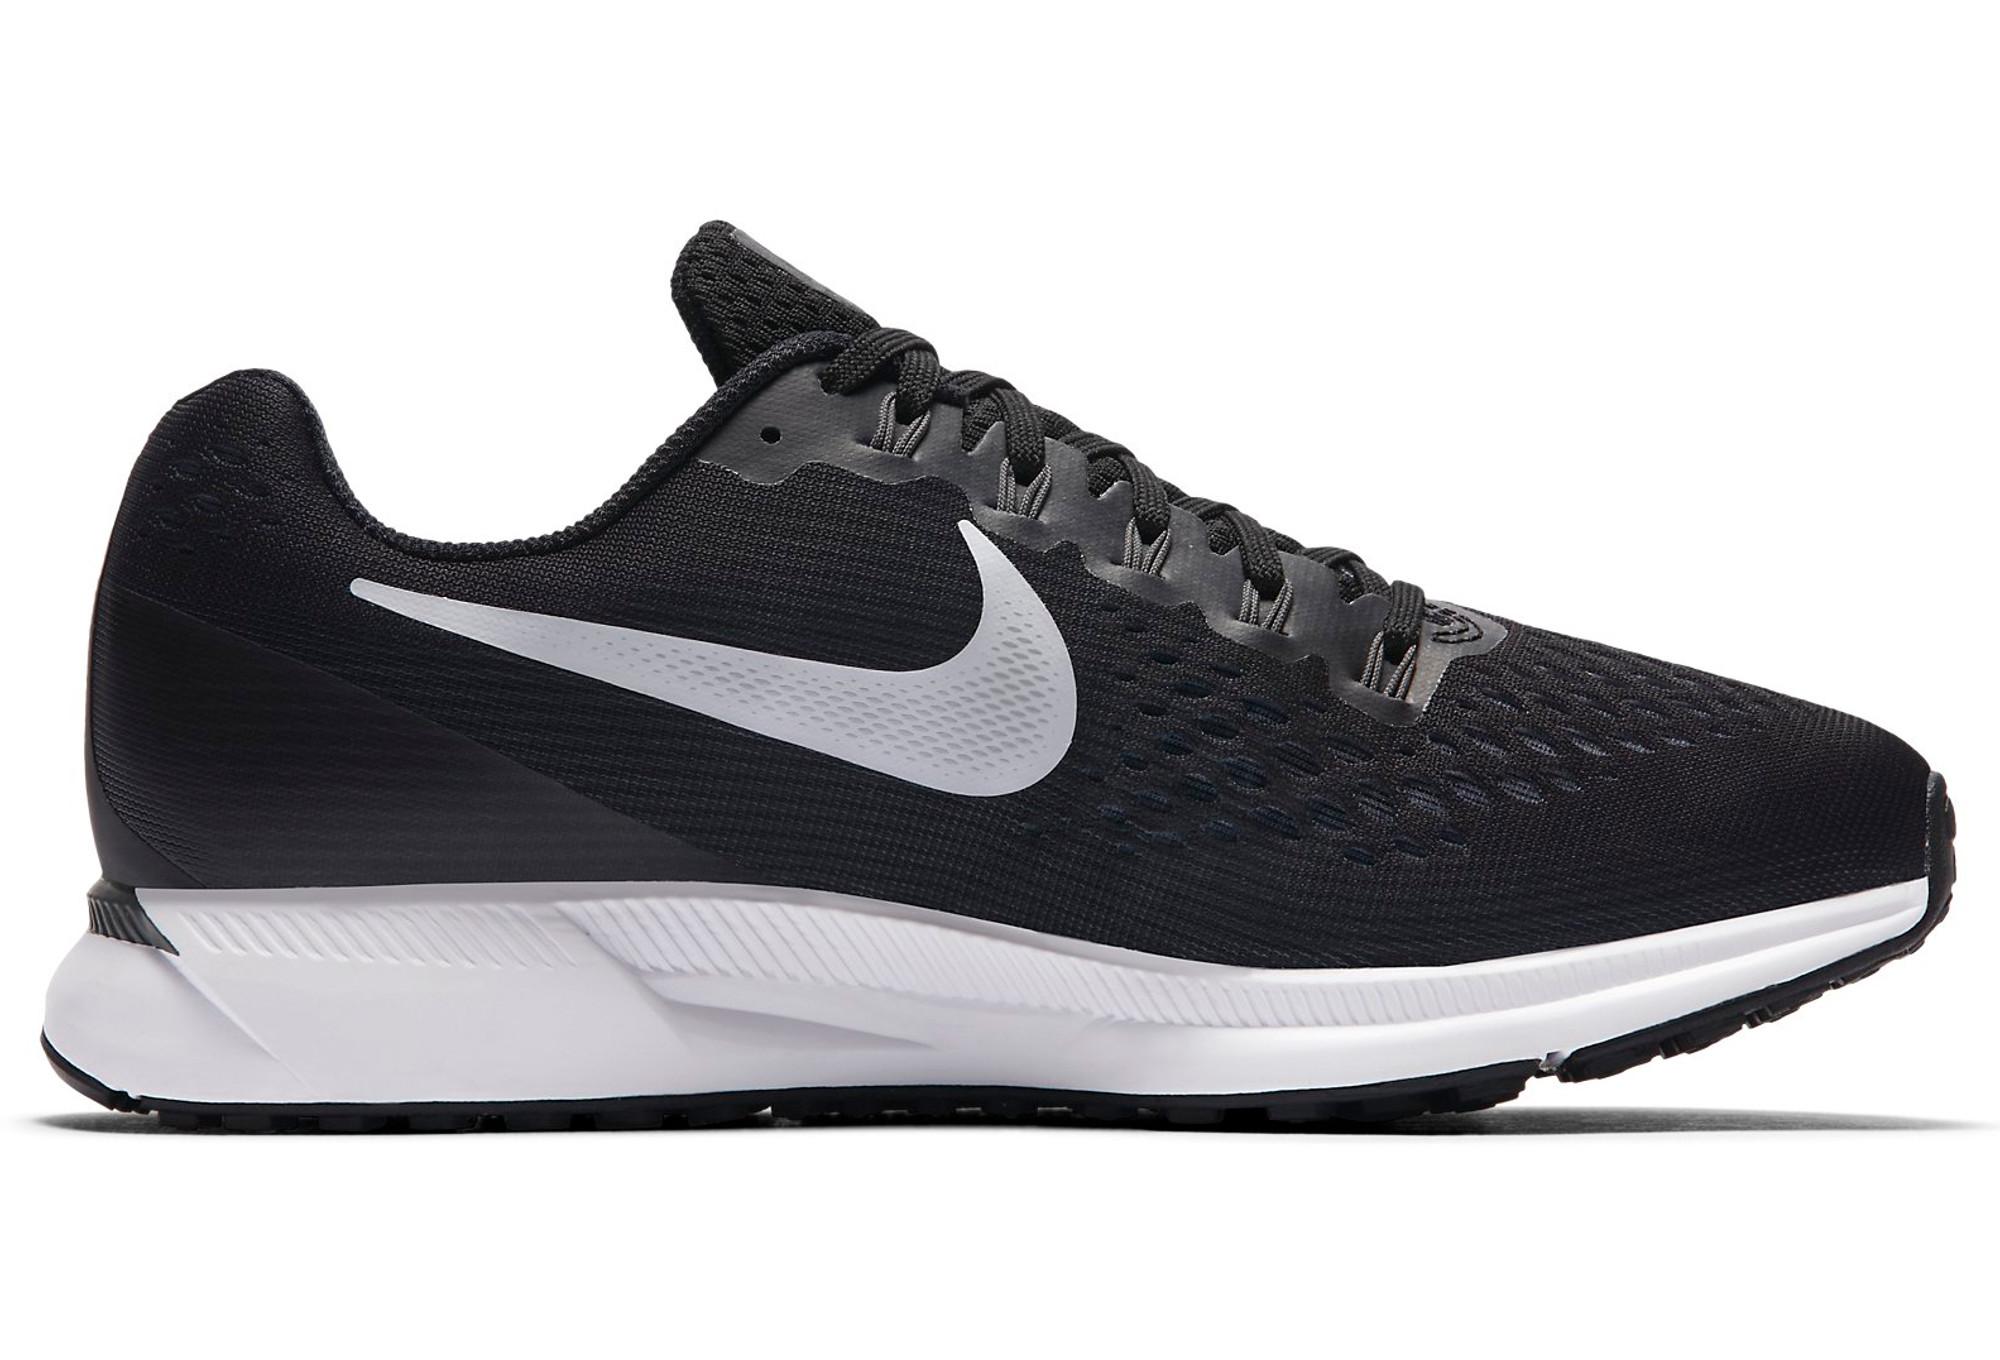 sports shoes f69ca ce493 Blanc Running Femme Chaussures Noir 34 Air Zoom Nike De Pegasus q5TwRT8Cn